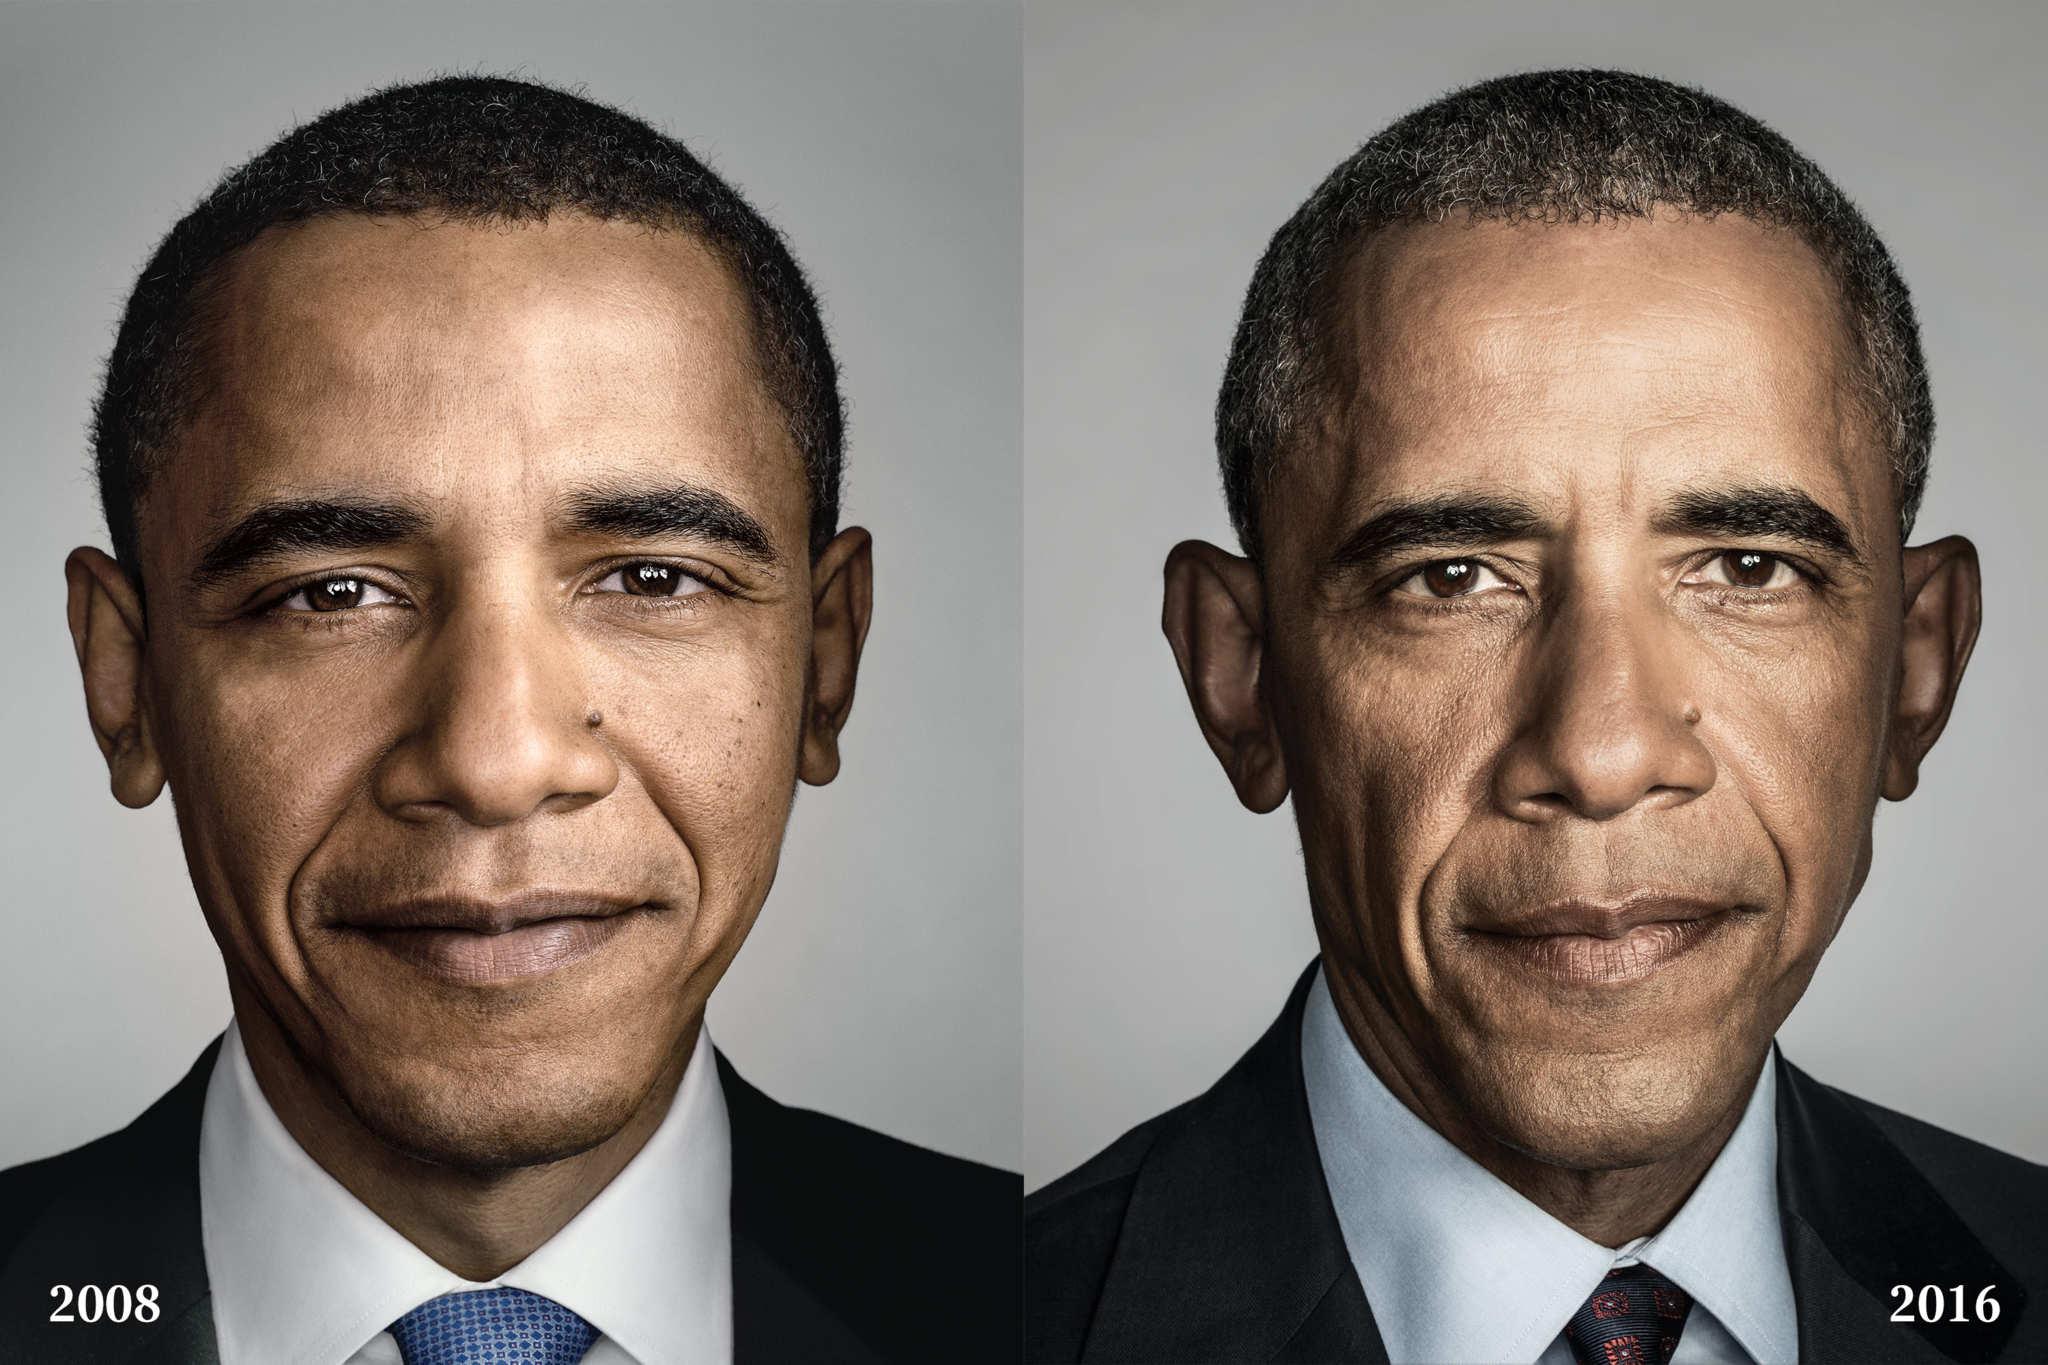 Barack Obama nel 2008 e nel 2016